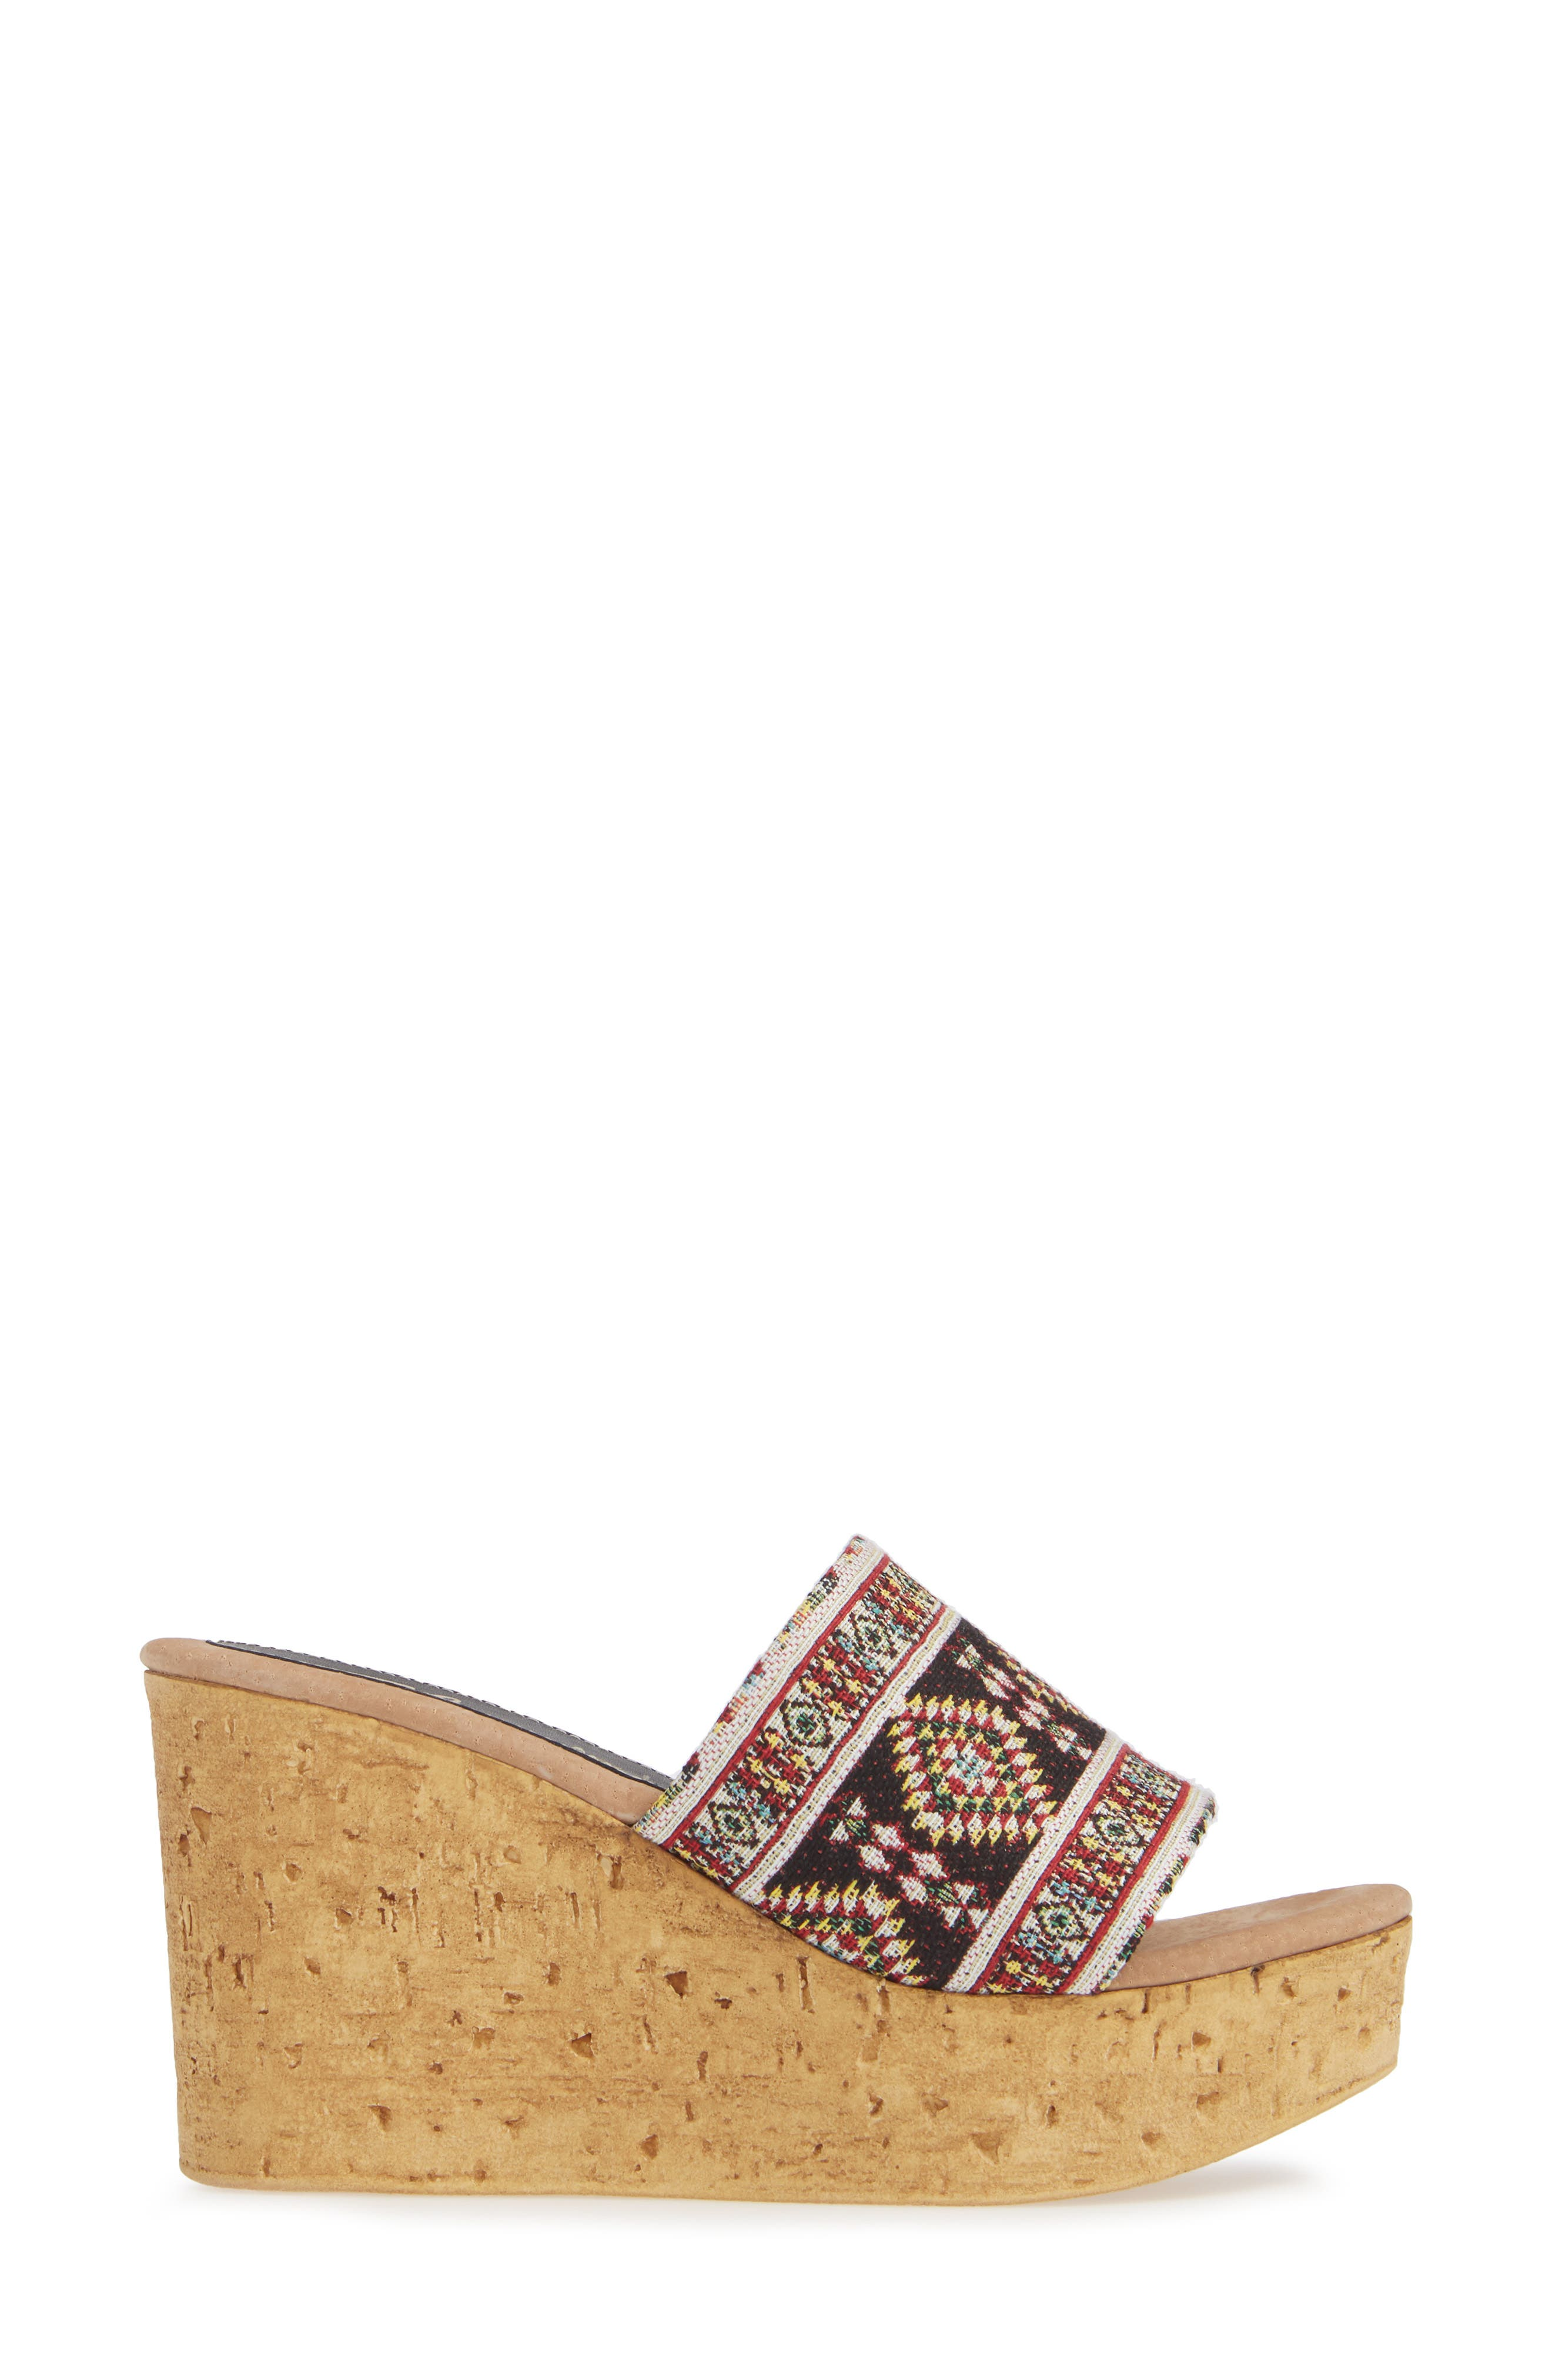 Orabela Platform Wedge Sandal,                             Alternate thumbnail 3, color,                             BLACK MULTICOLOR FABRIC